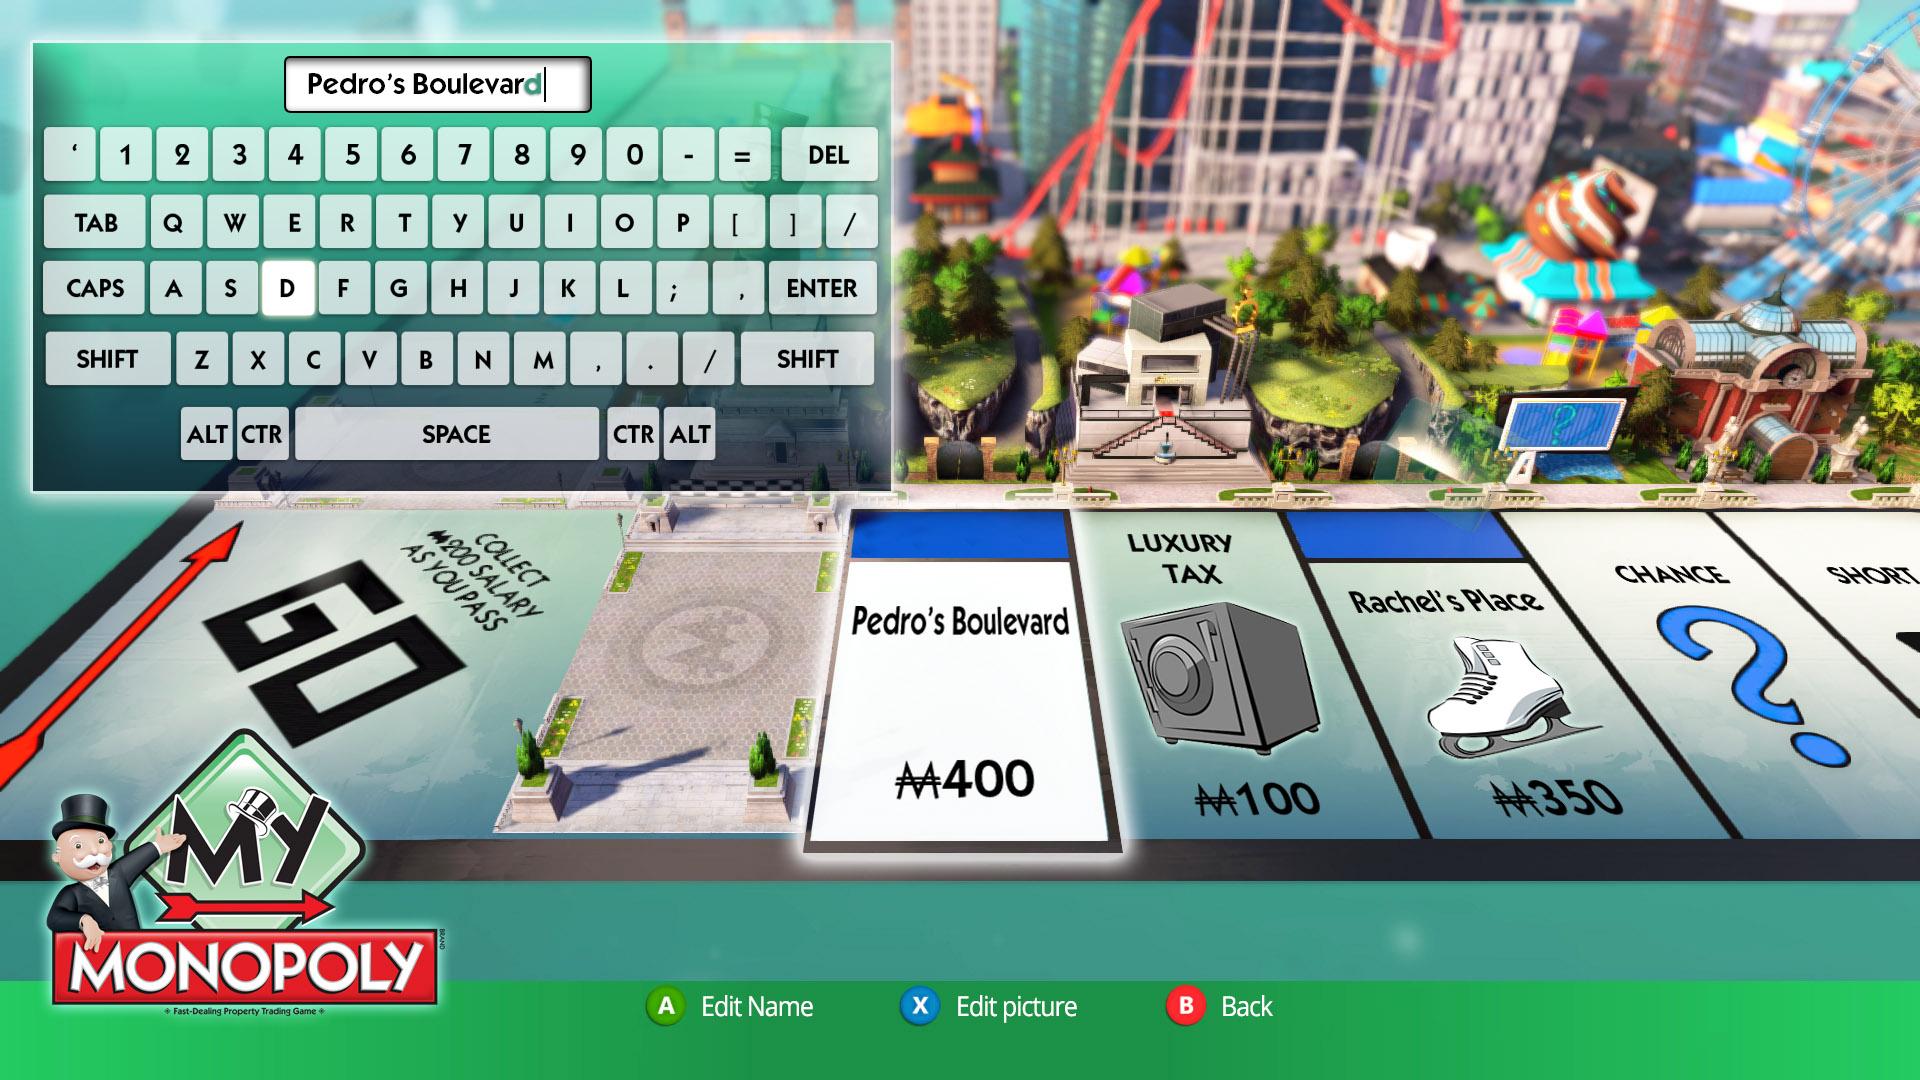 HBC My Monopoly Screens 5